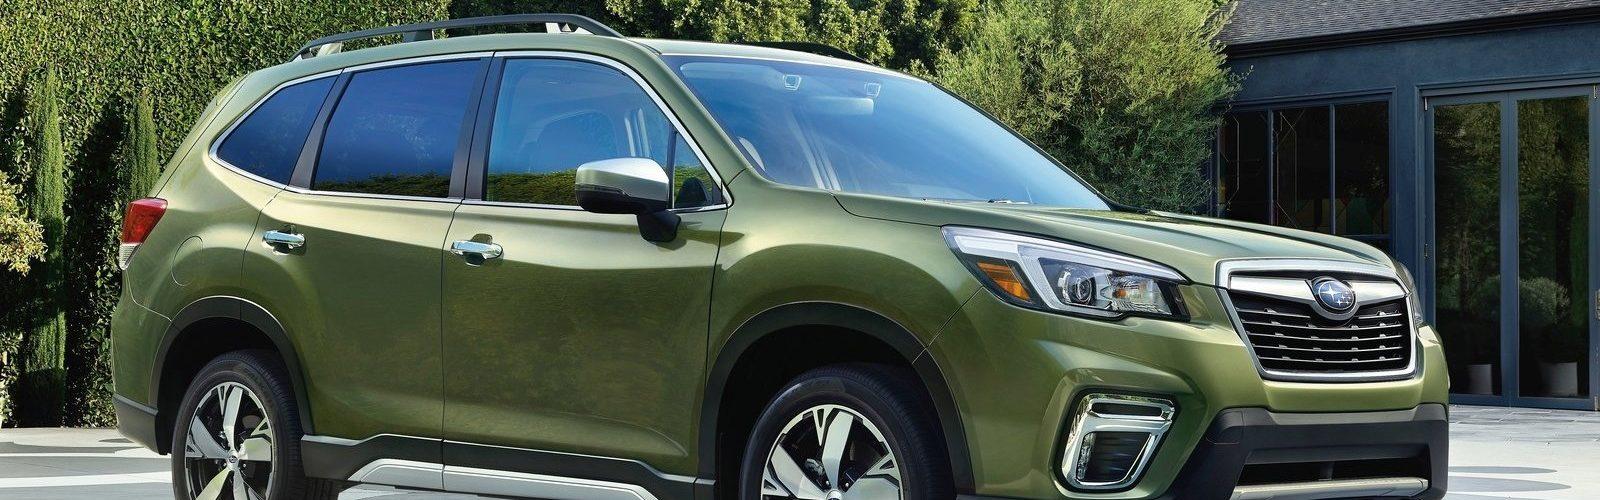 prix Subaru Forester e-Boxer hybride 2019